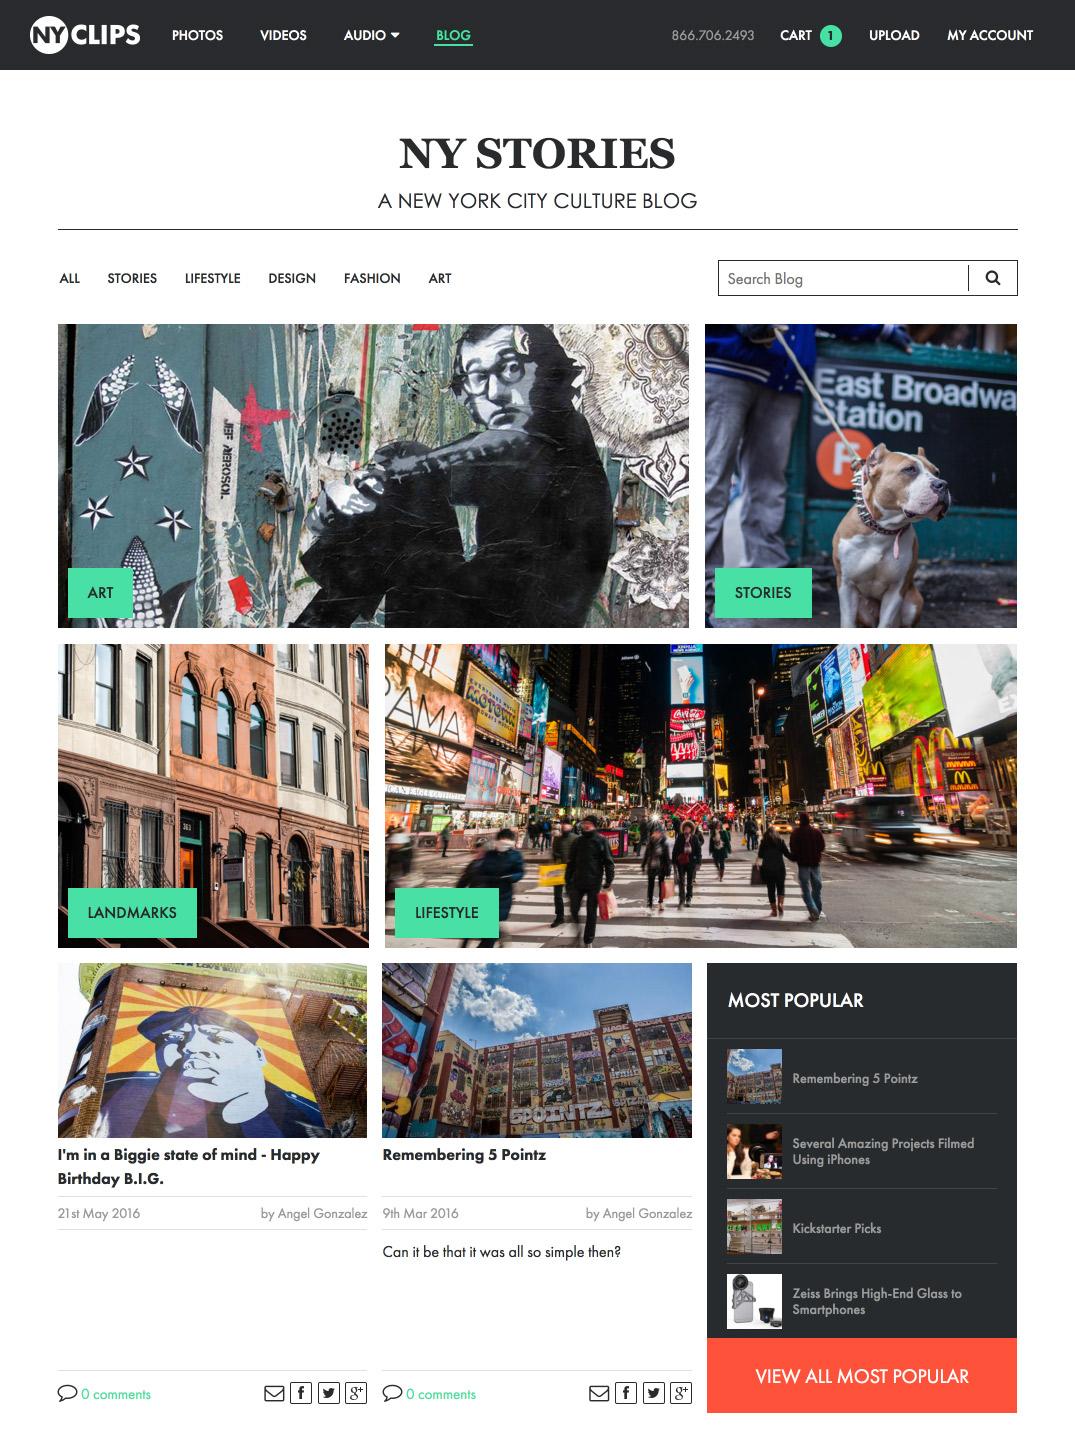 screenshot-www.nyclips.com-2017-06-16-19-30-02